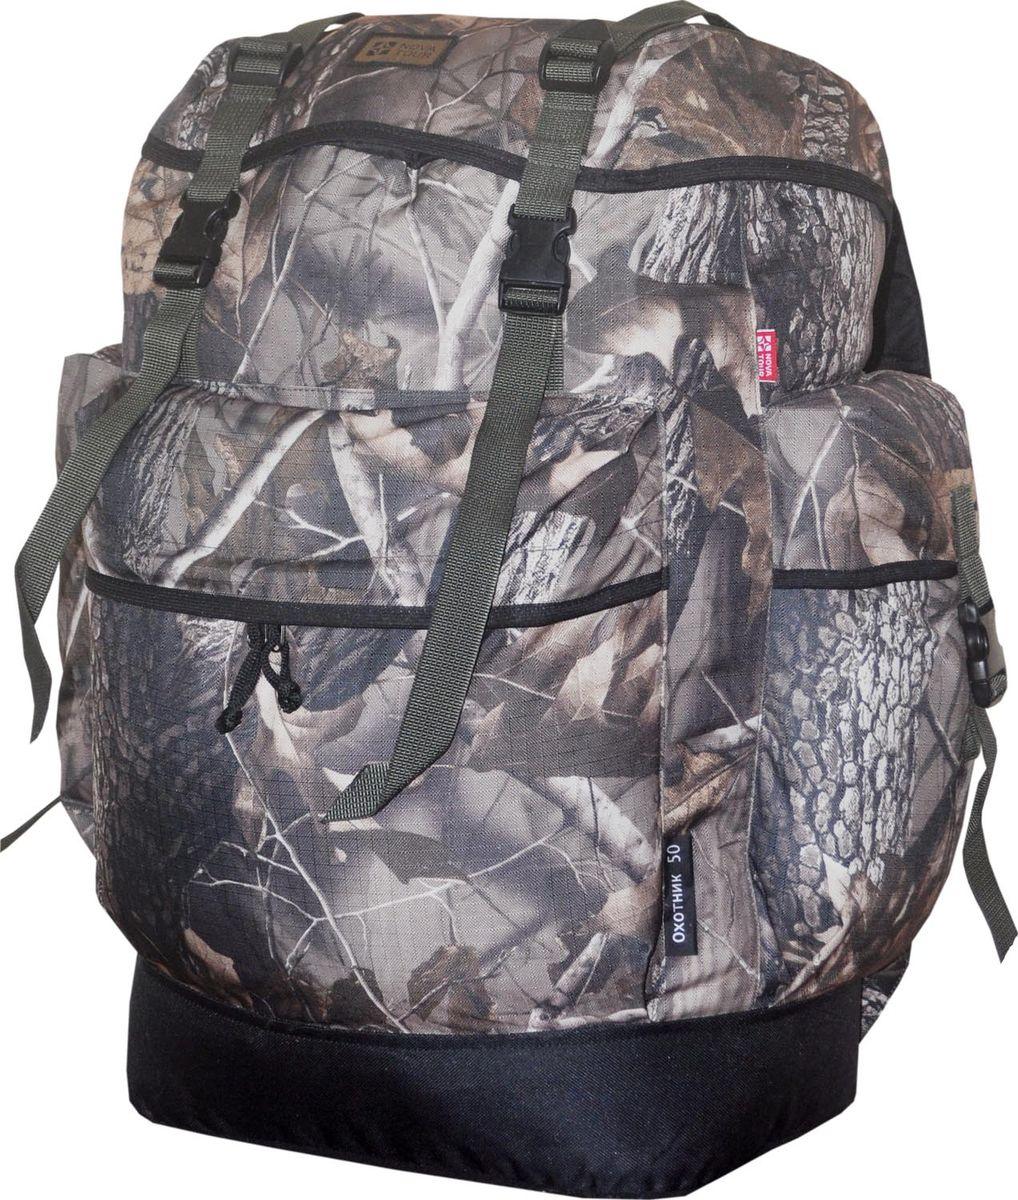 Рюкзак охотник 35 км n лес кат.a рюкзак odyssey 120